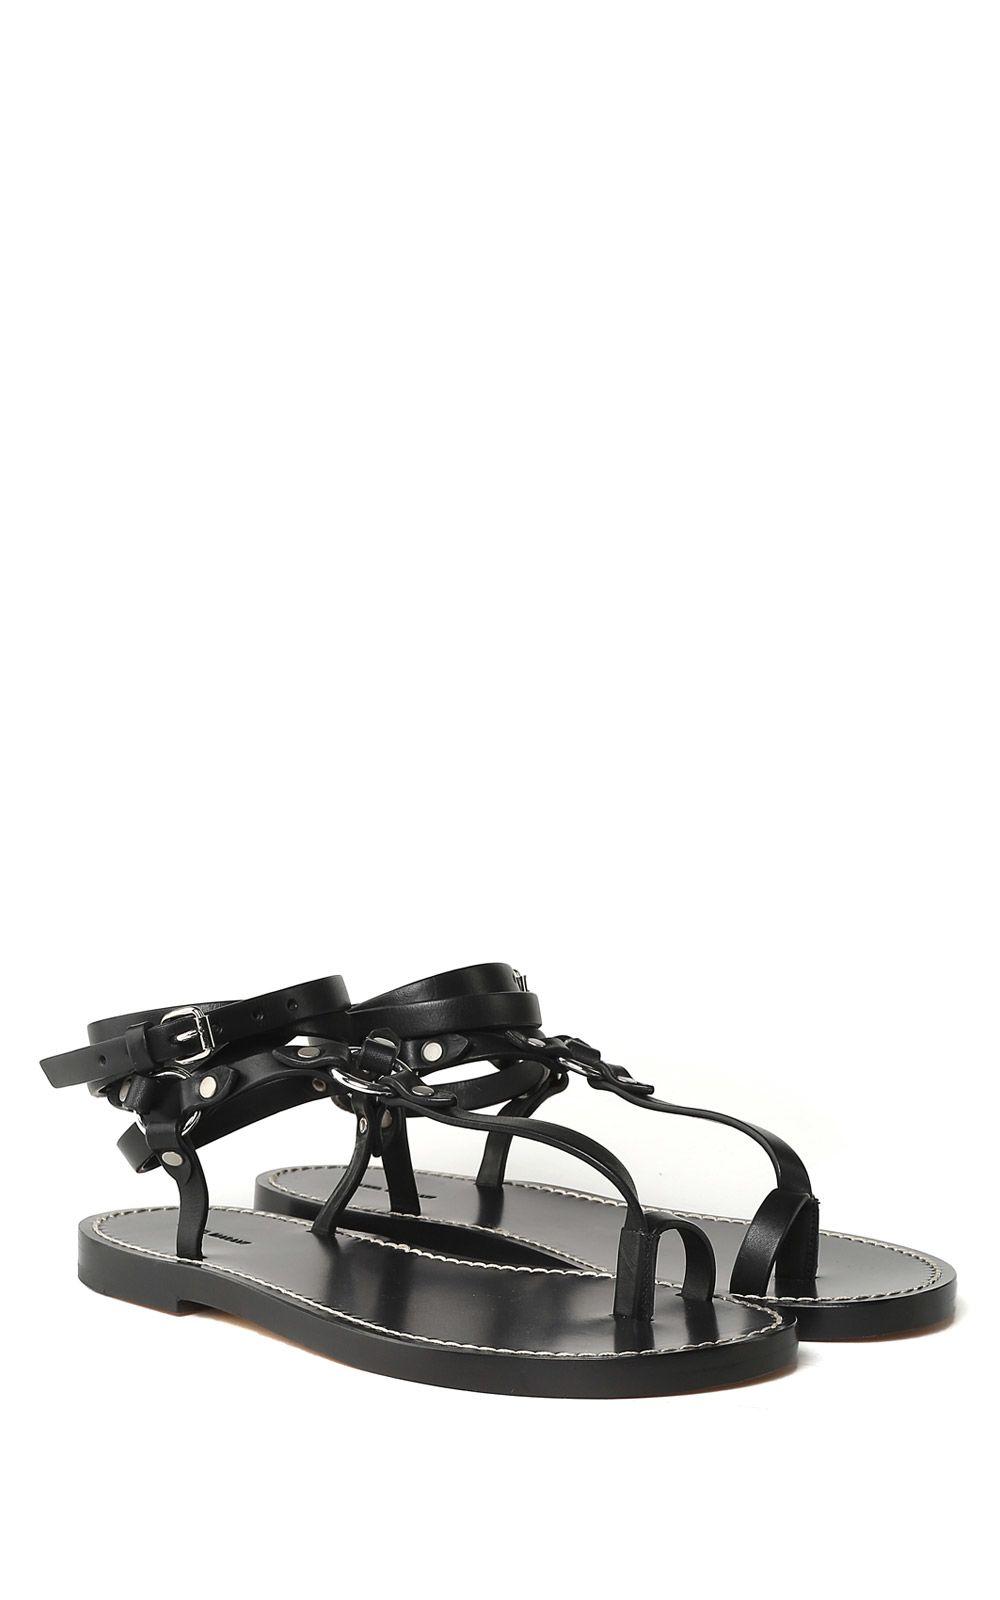 Joxxy toe-post leather sandals Isabel Marant Hyf8Z7keF1